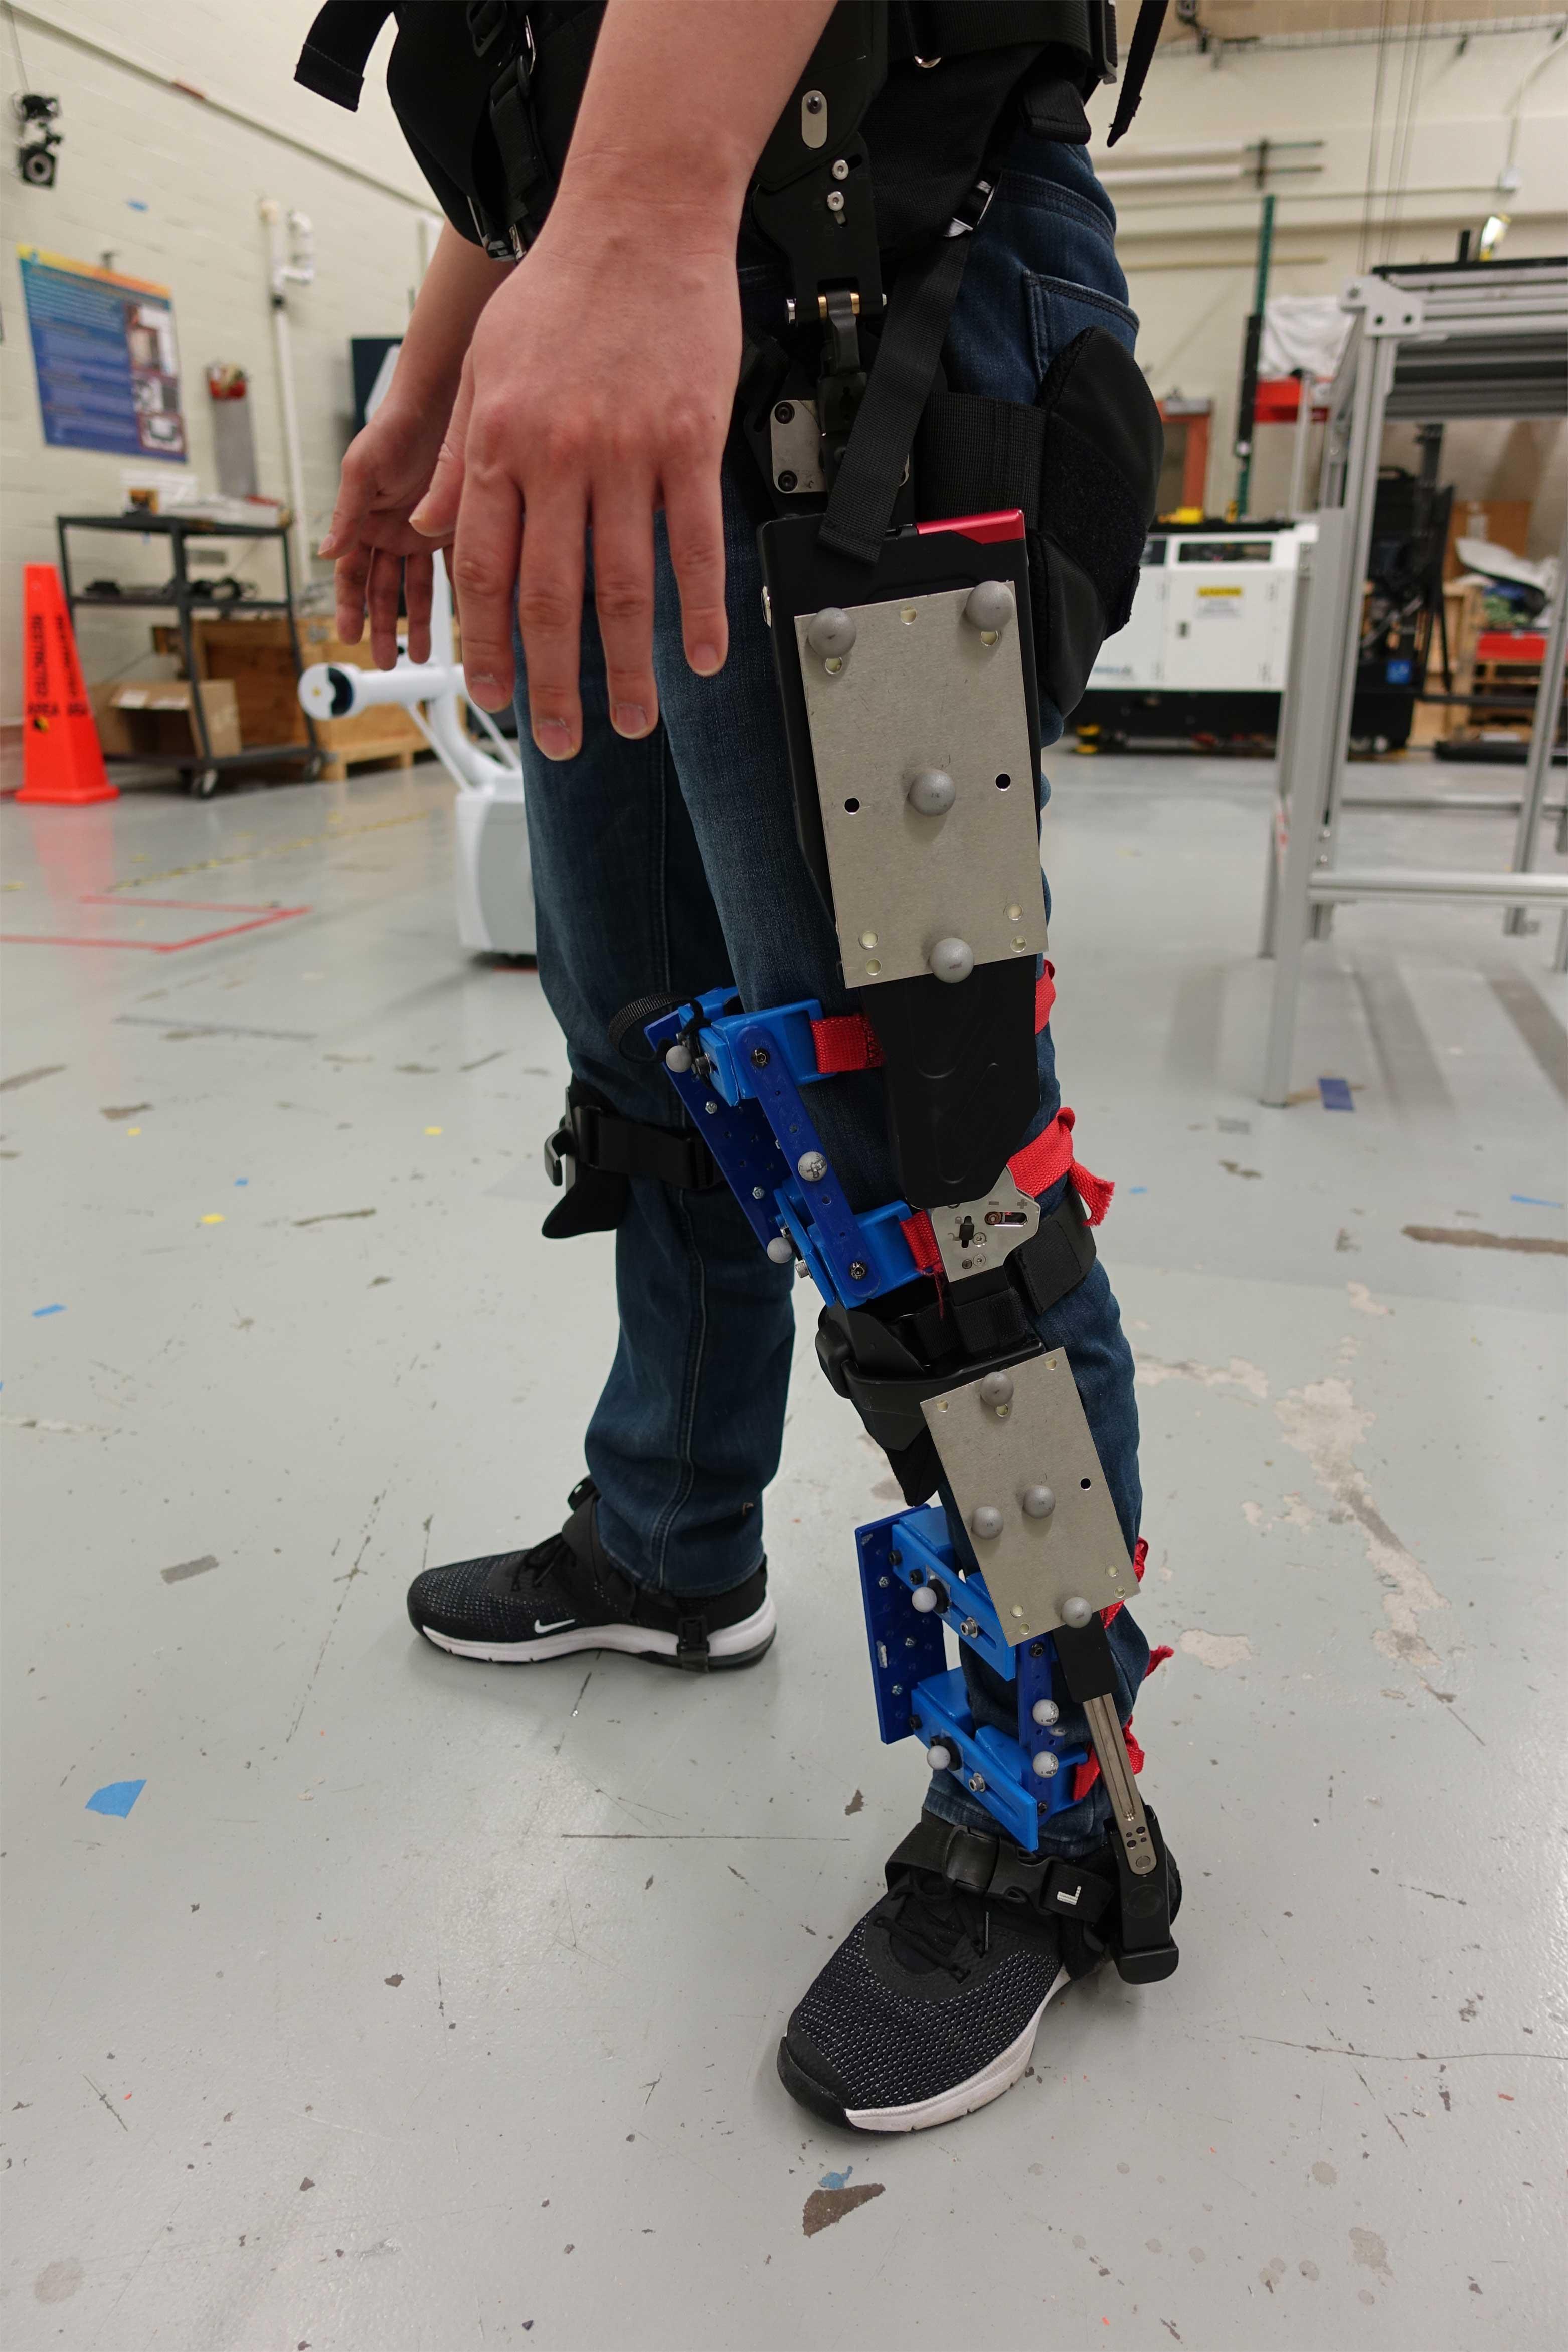 exoskeleton nist gov marches research study forward knee eurekalert test